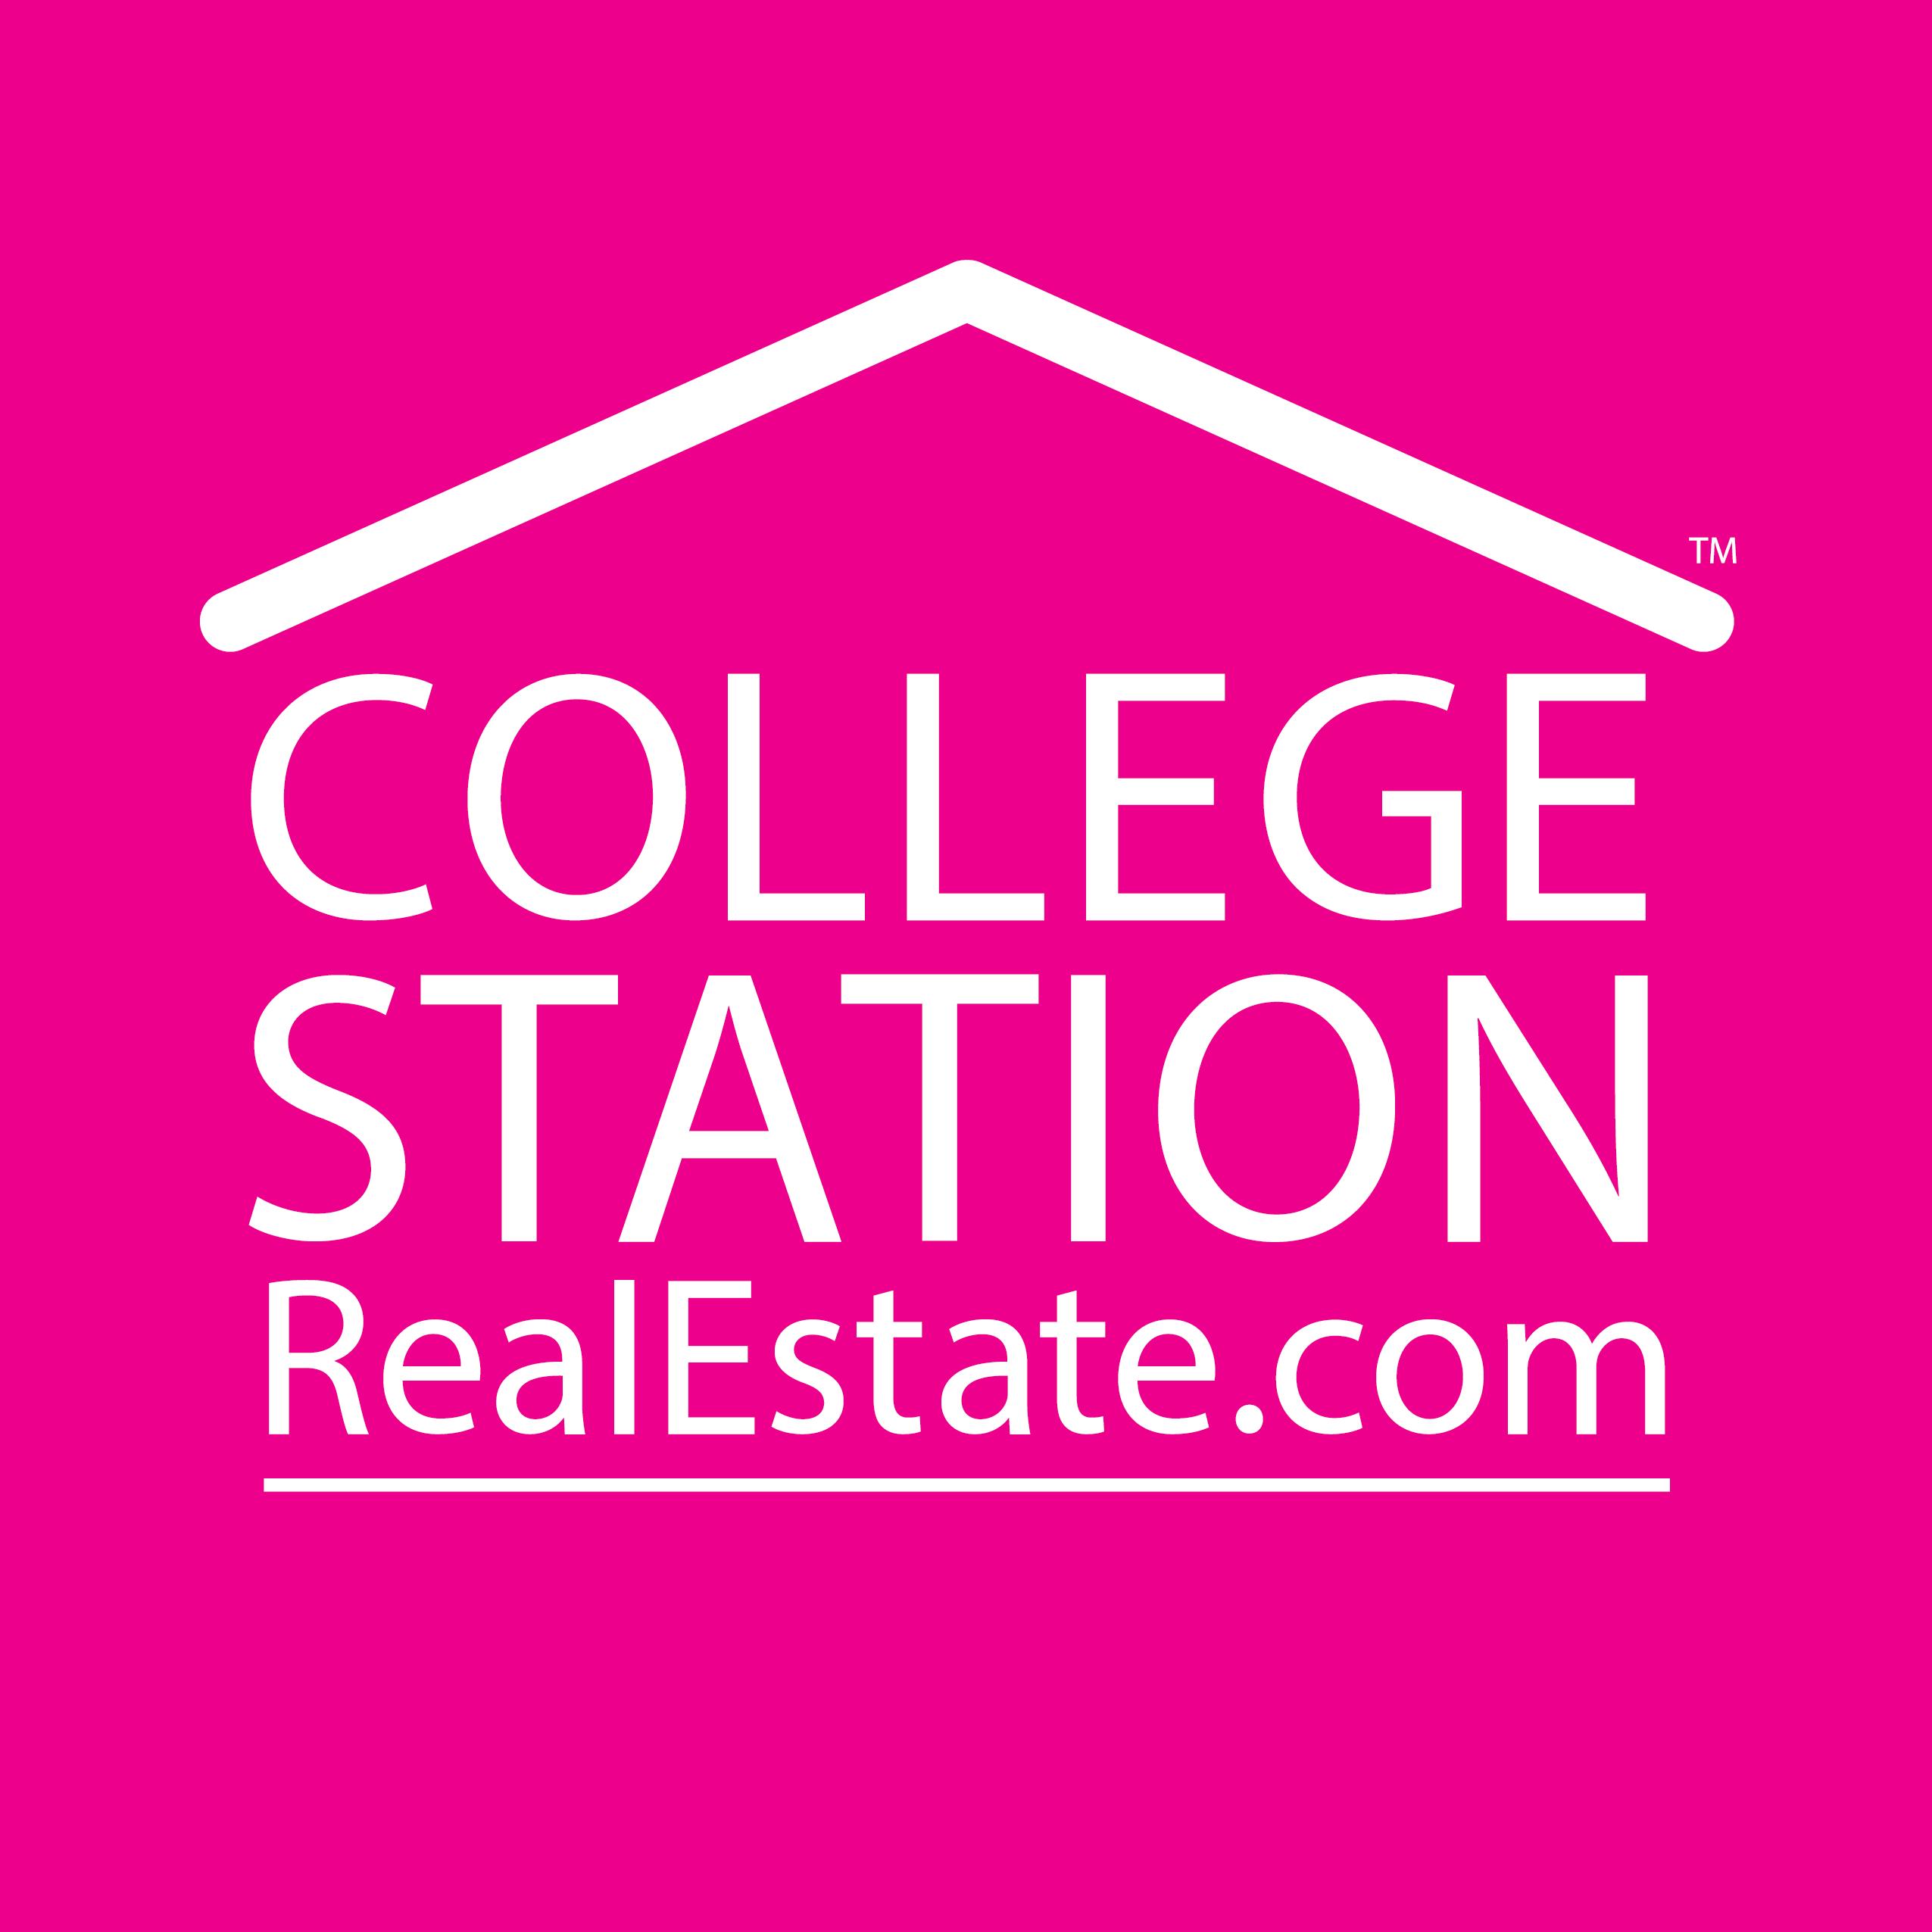 CollegeStationRealEstate.com logo